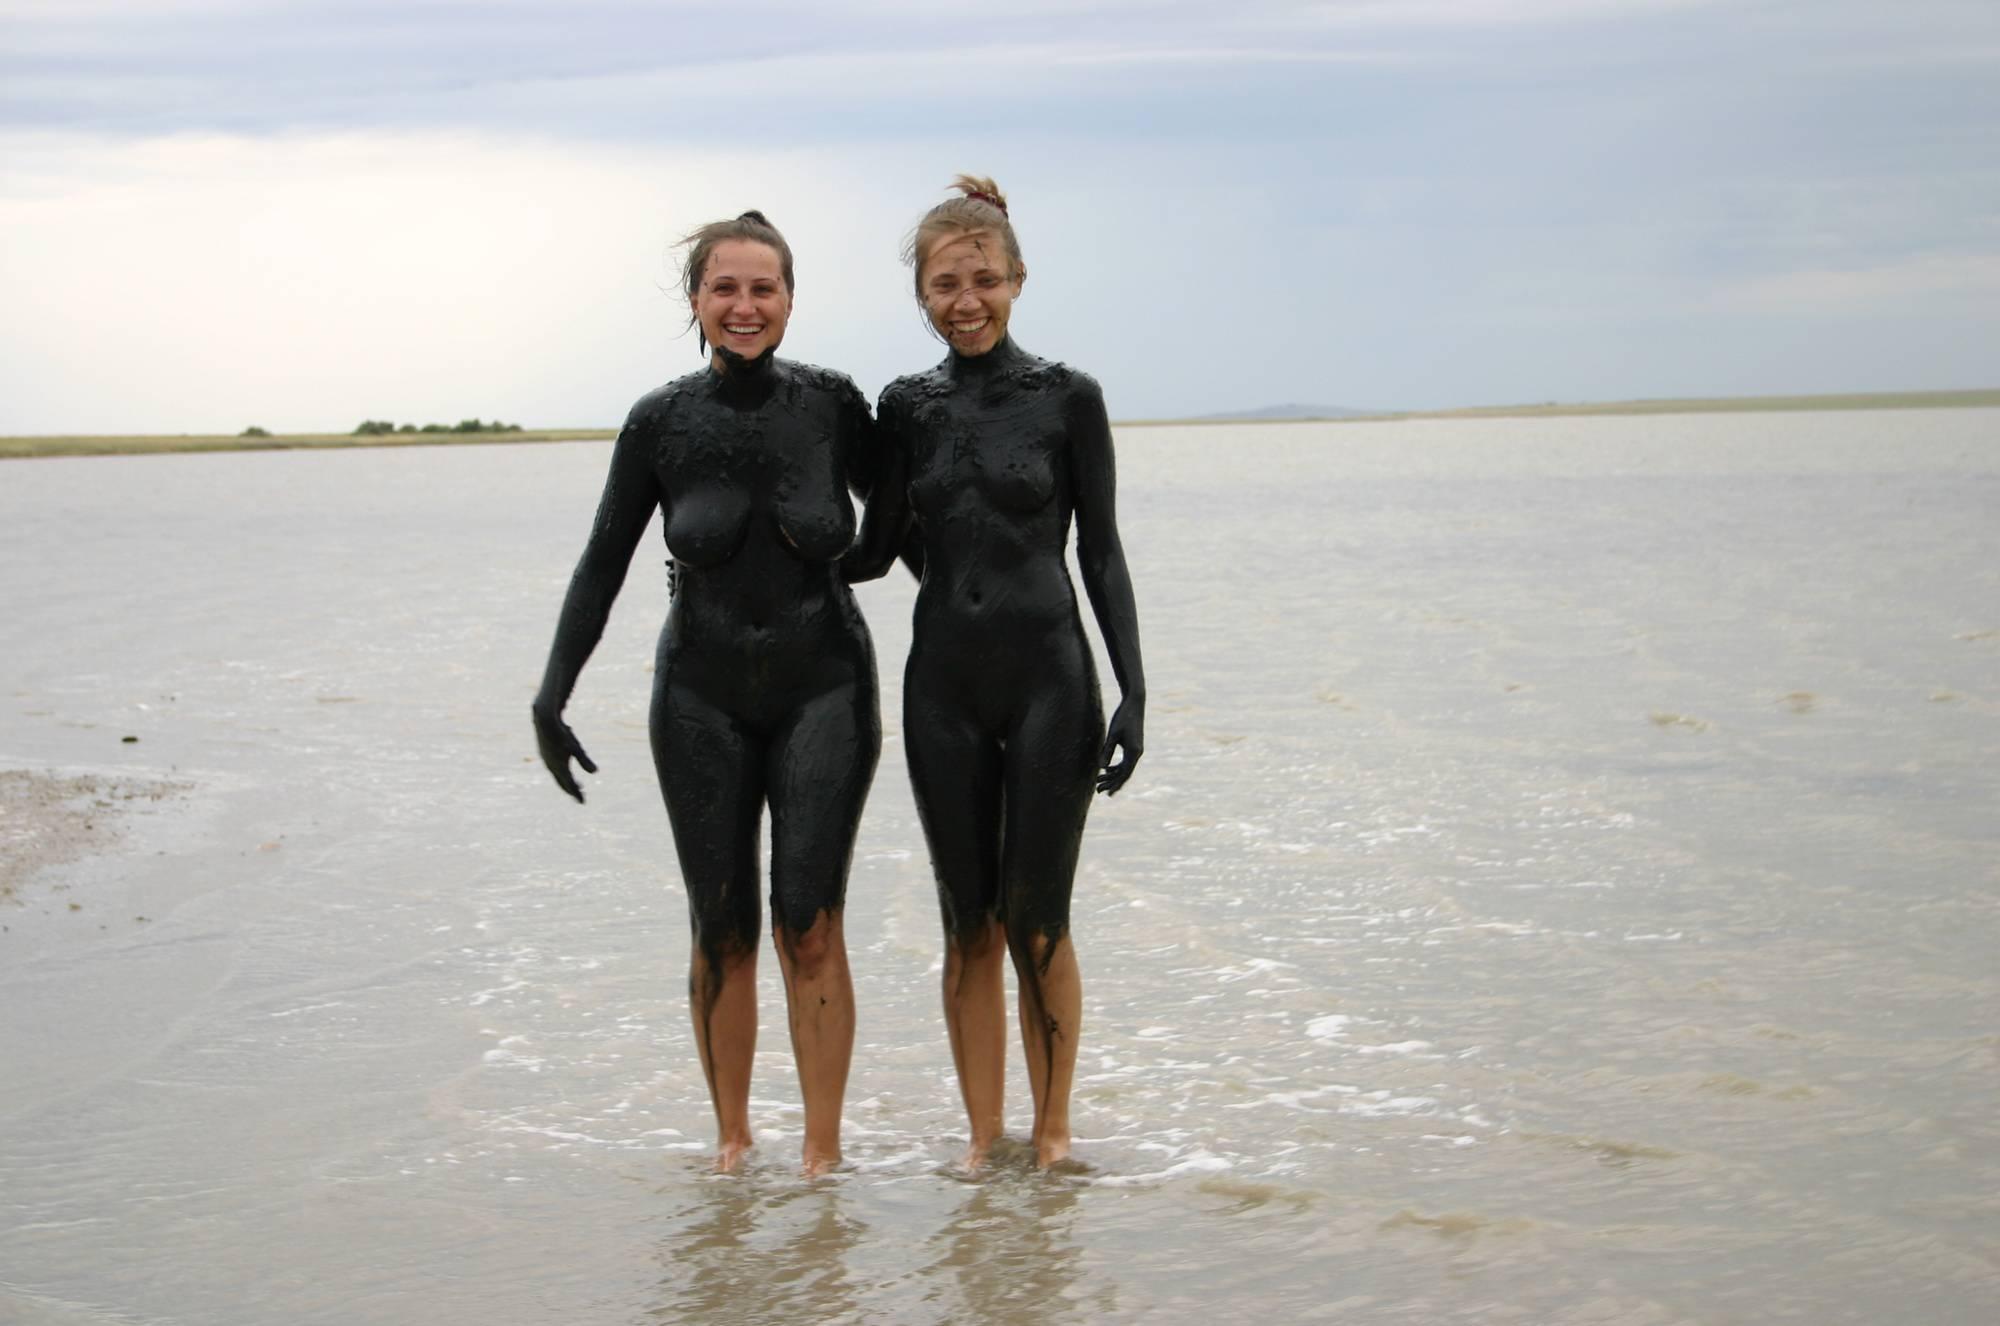 Nudist Photos Black-Sea Body Mud Shots - 2